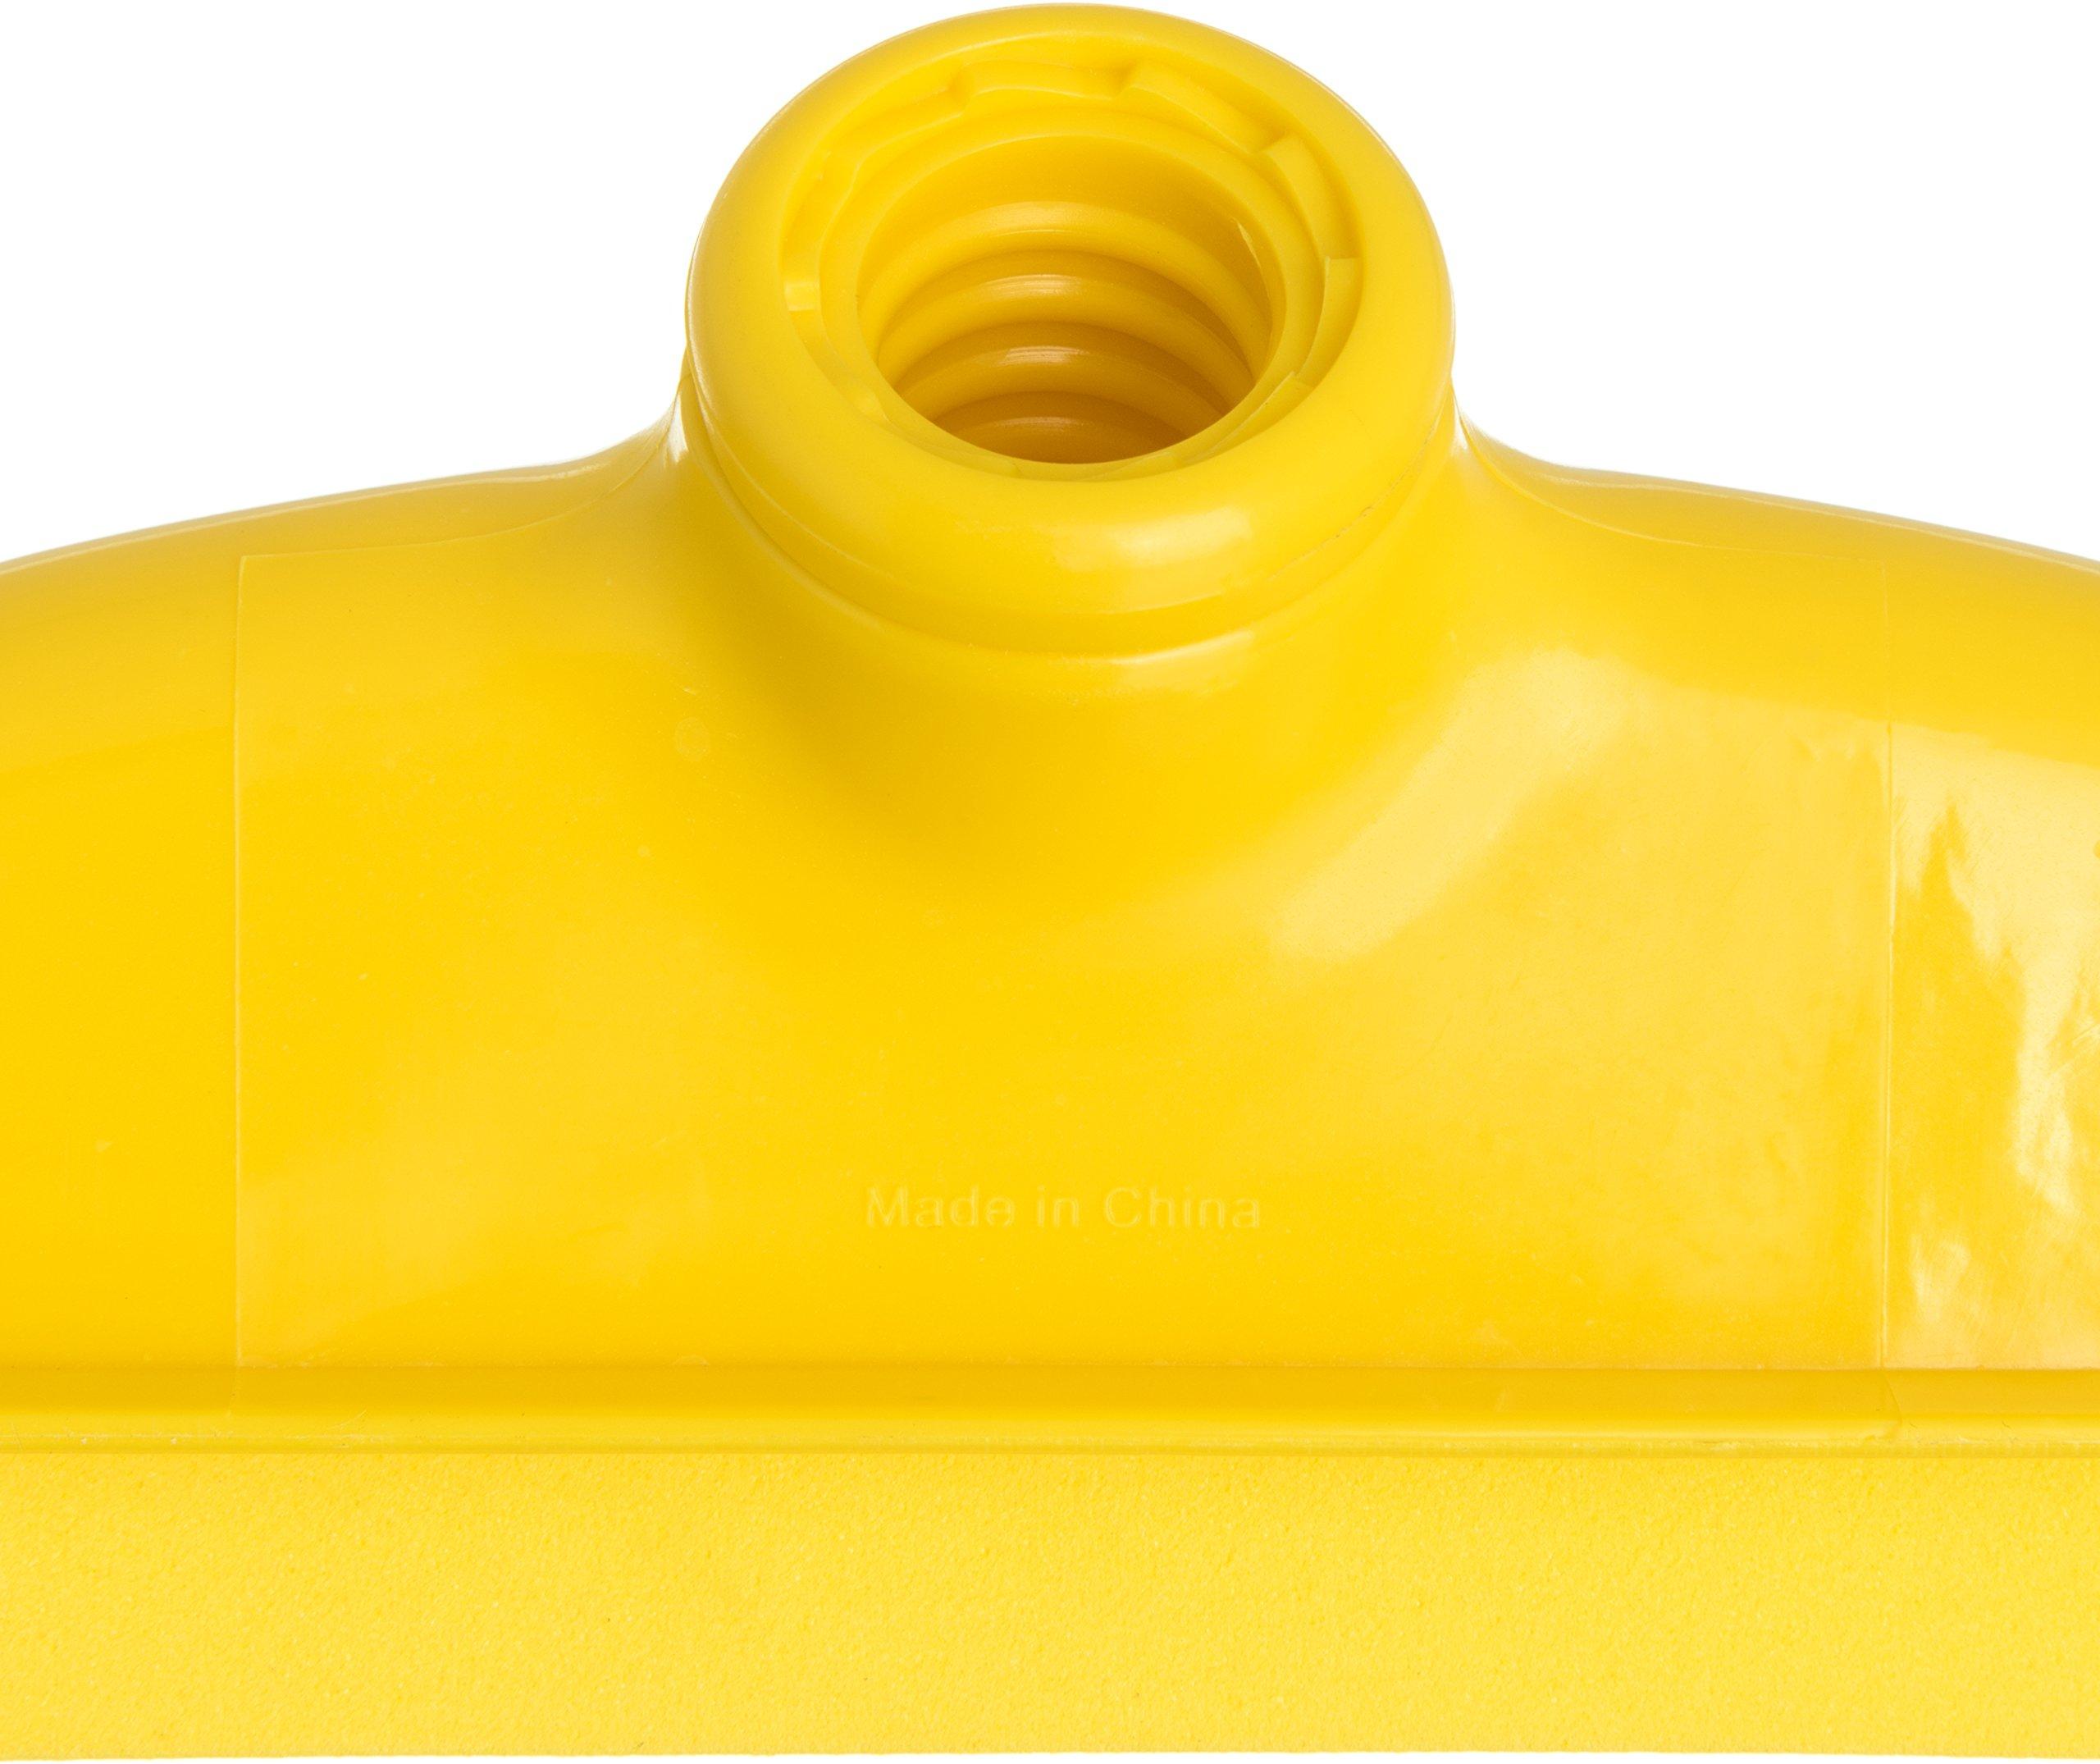 Carlisle 4156804 Spectrum Double Foam Rubber Floor Squeegee, 24'' Width, Yellow (Case of 6) by Carlisle (Image #4)